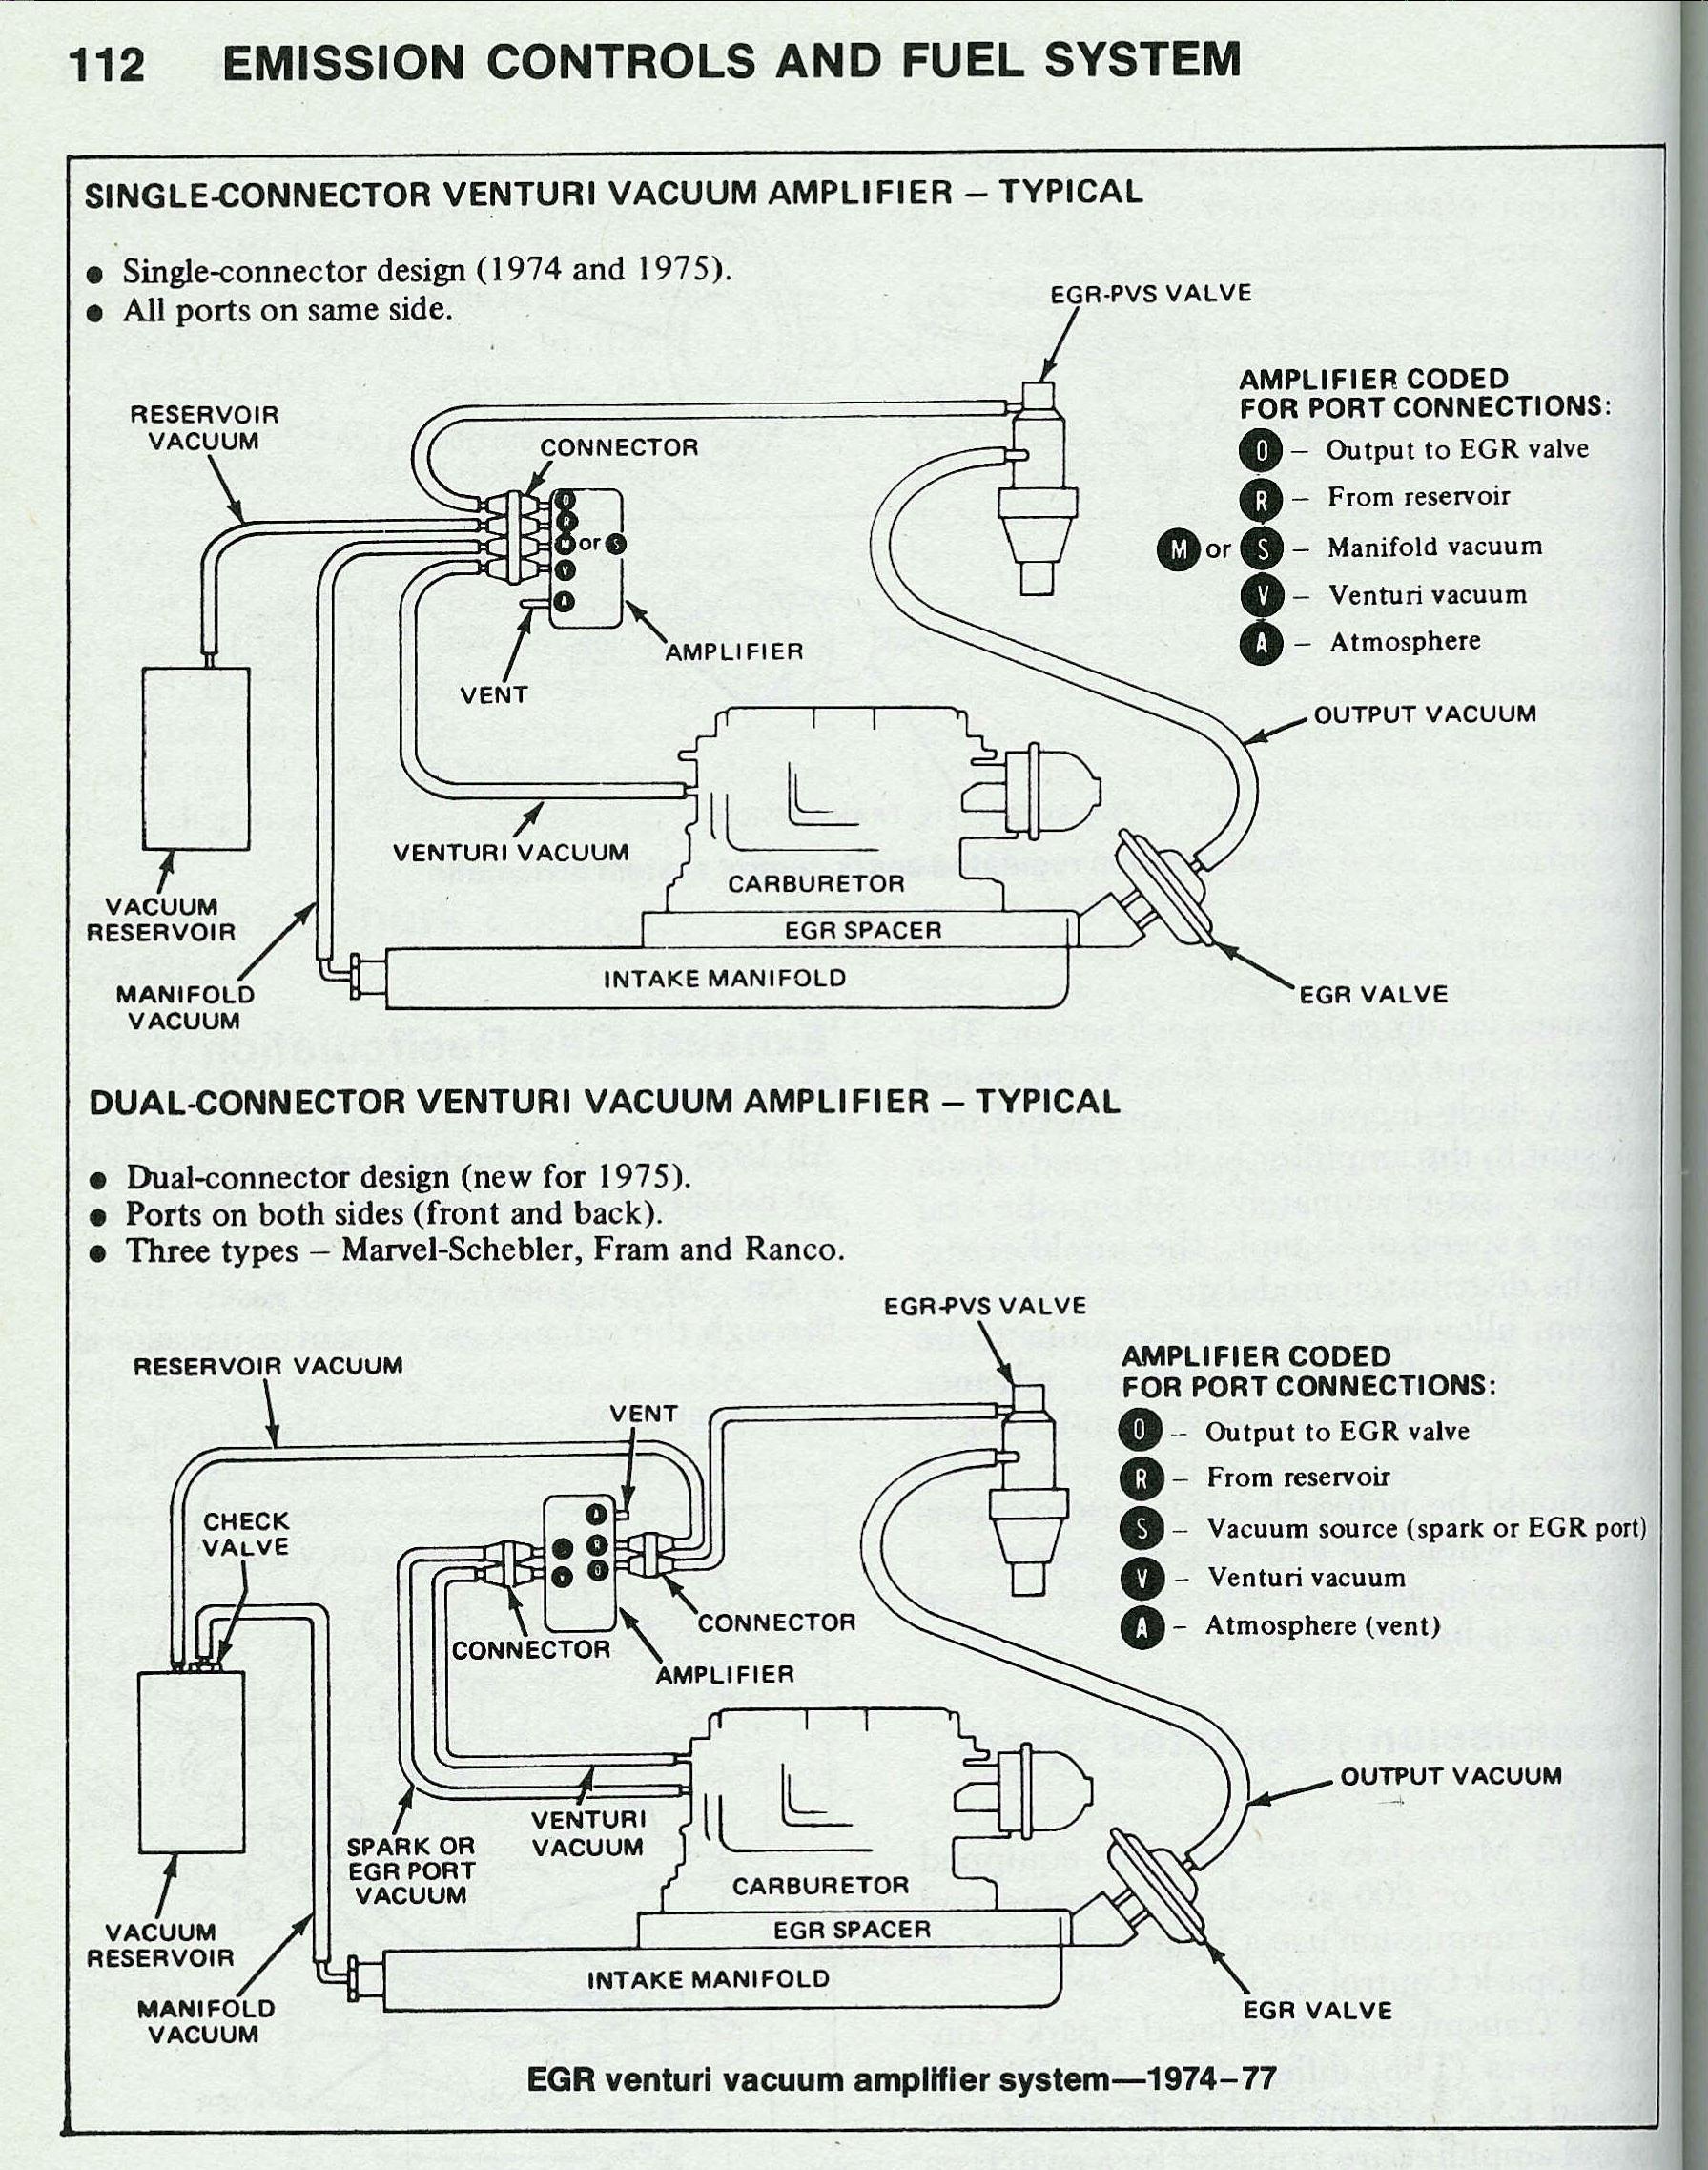 carburetor vacuum line diagram cow circulatory system holley free engine